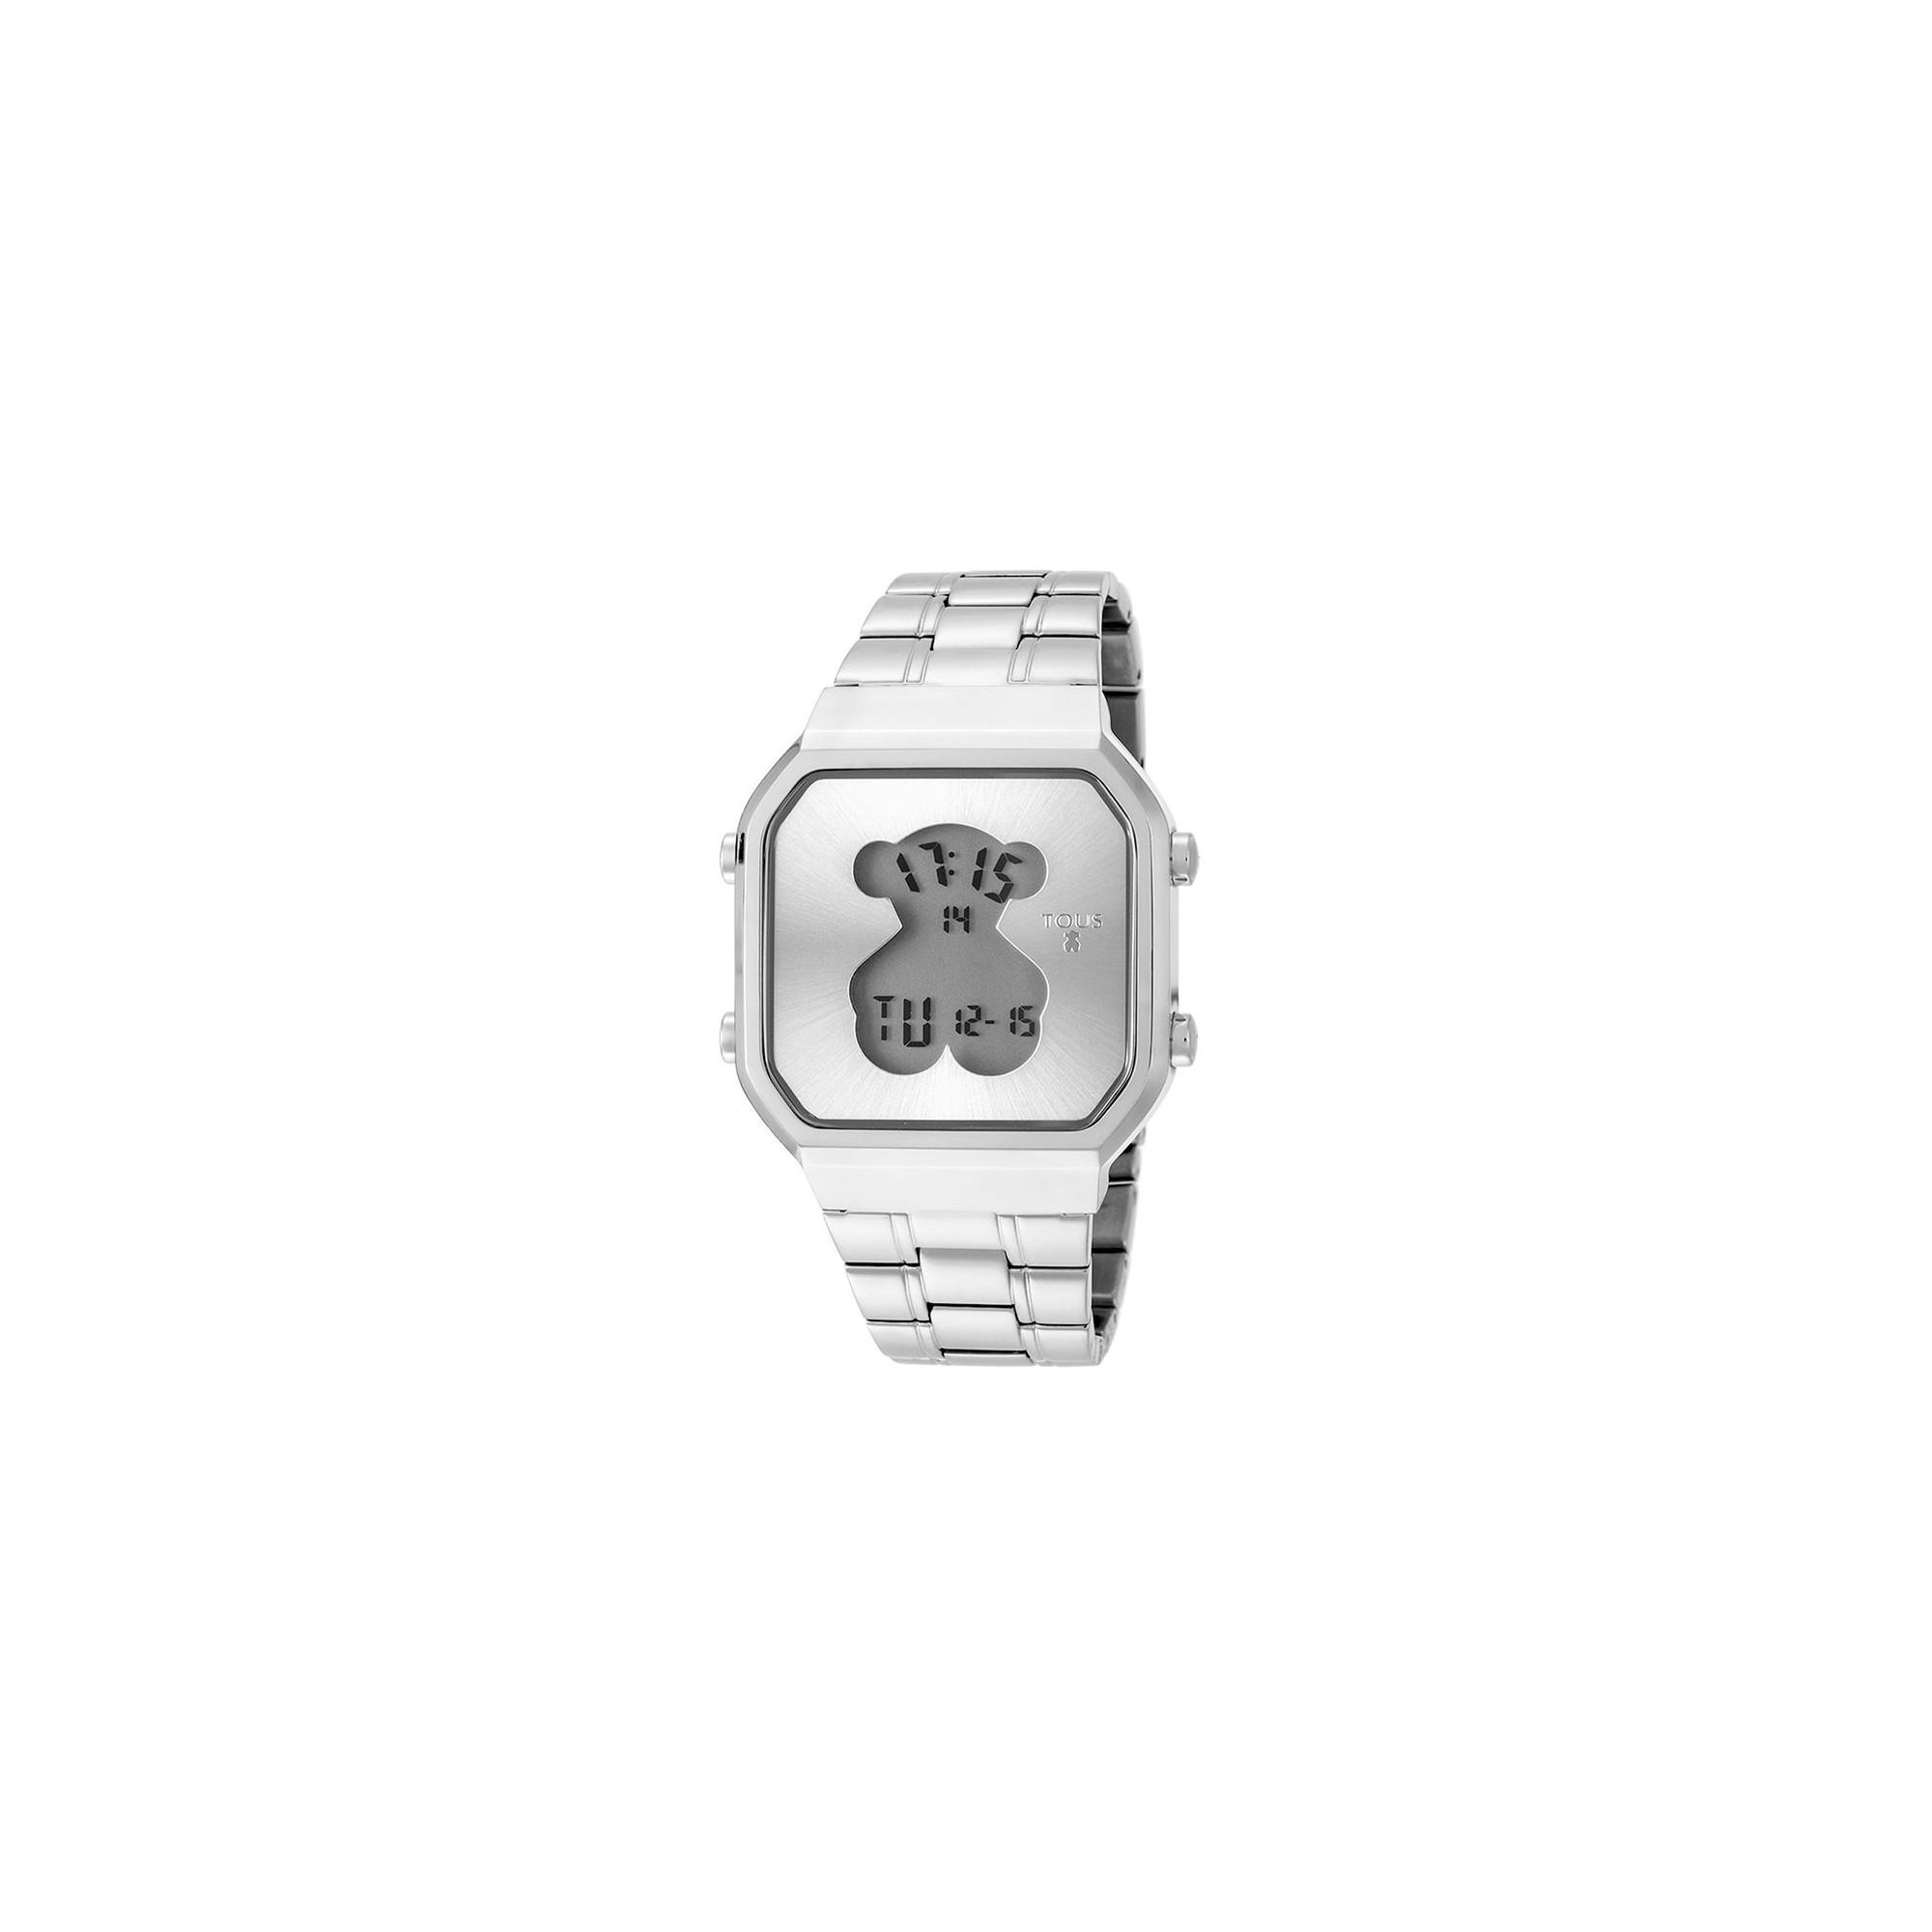 a93d51b27833 Reloj Tous Chica D-Bear Digital Brazalete Acero 600350275